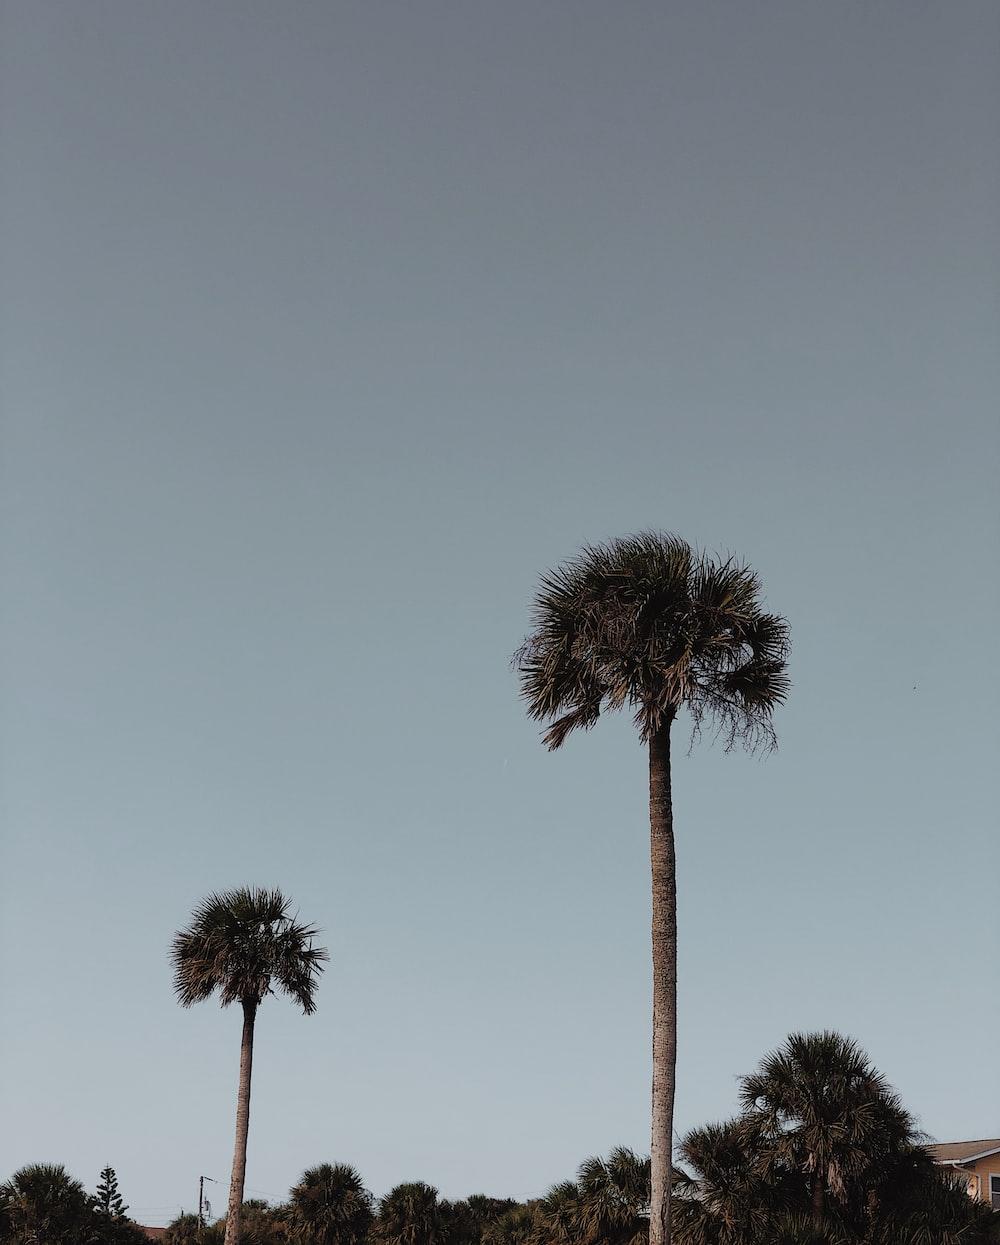 green pal trees photo